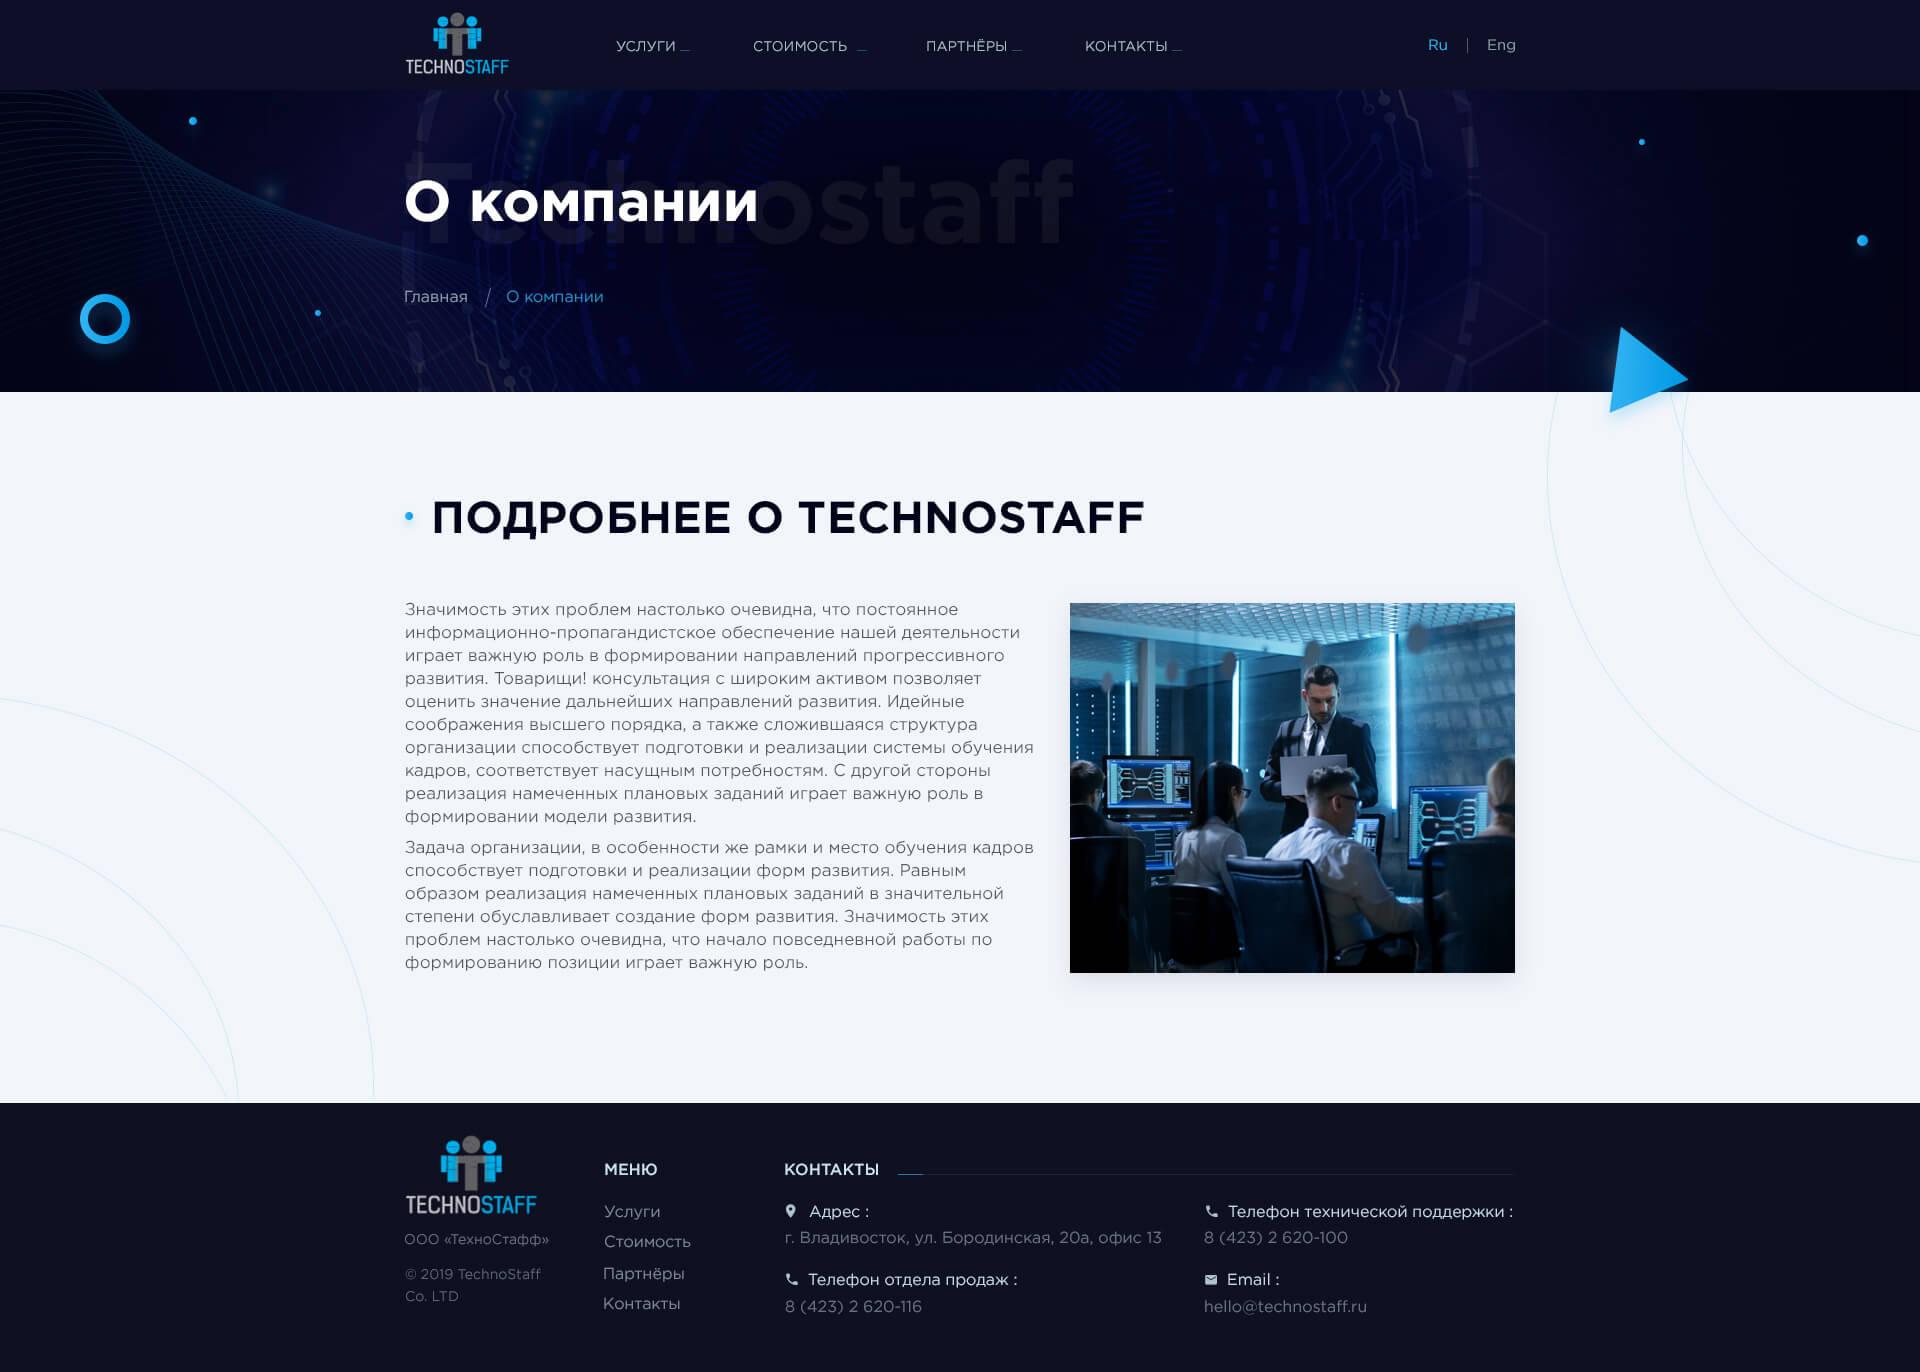 Technostaff_About company_1.1